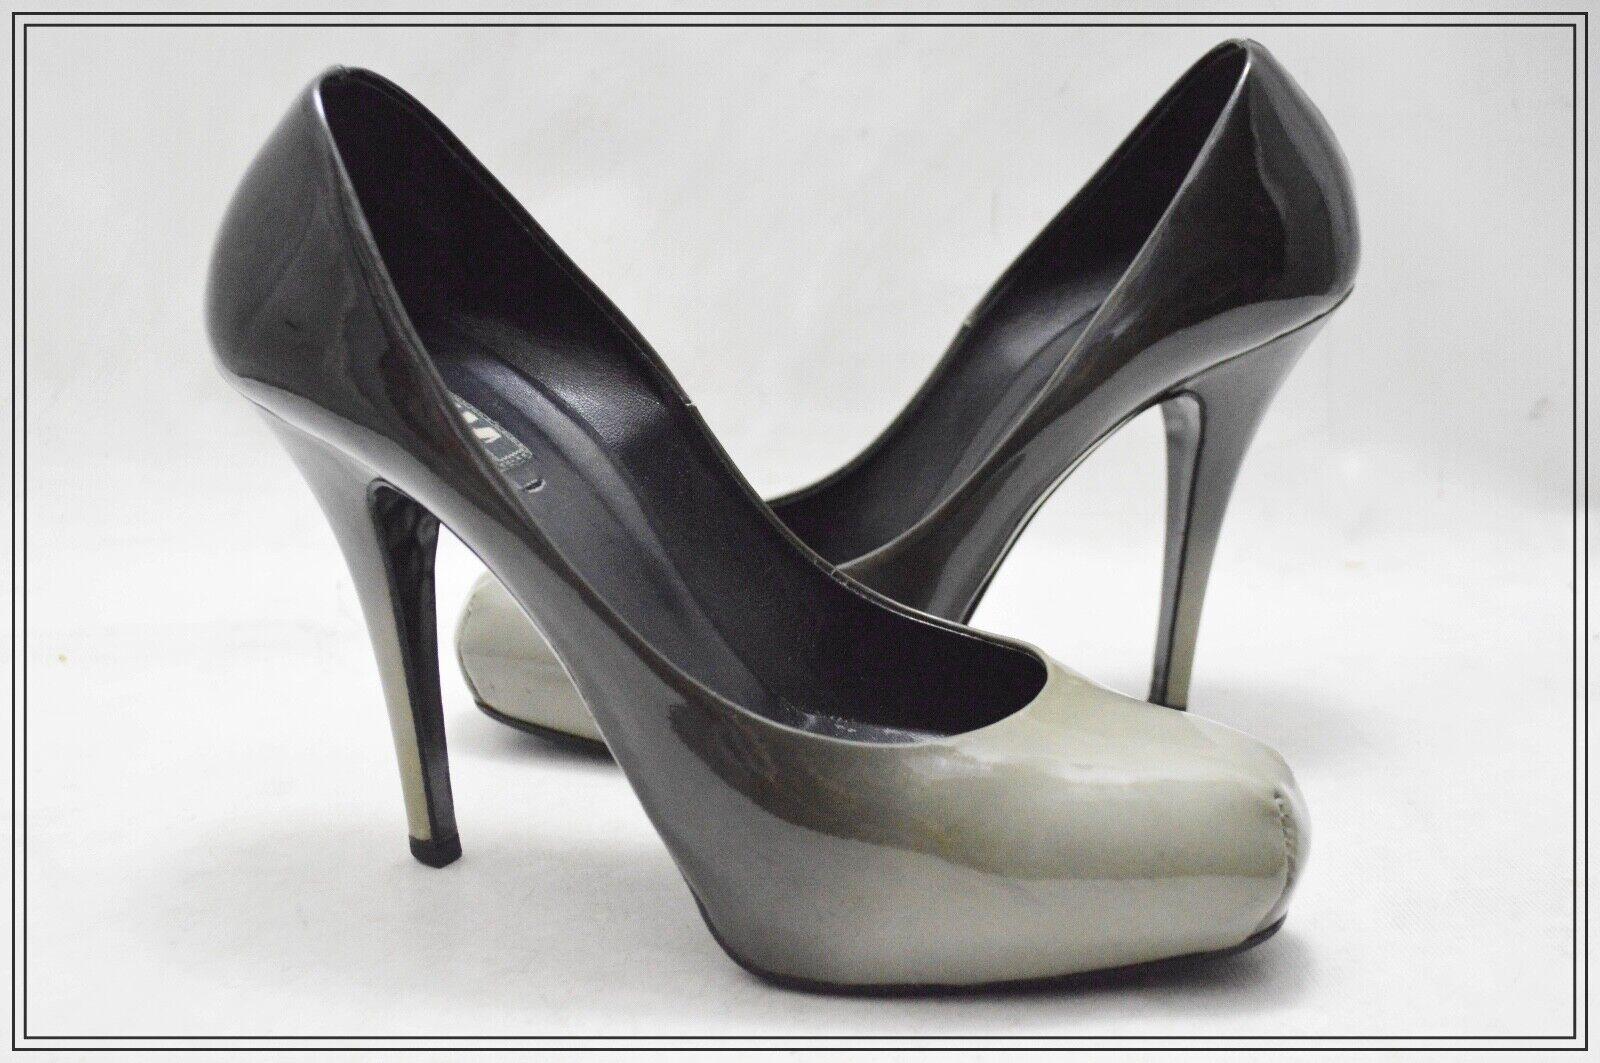 LE SILLA Patent Genuine Leather Ombre Women's Heels EUR 40